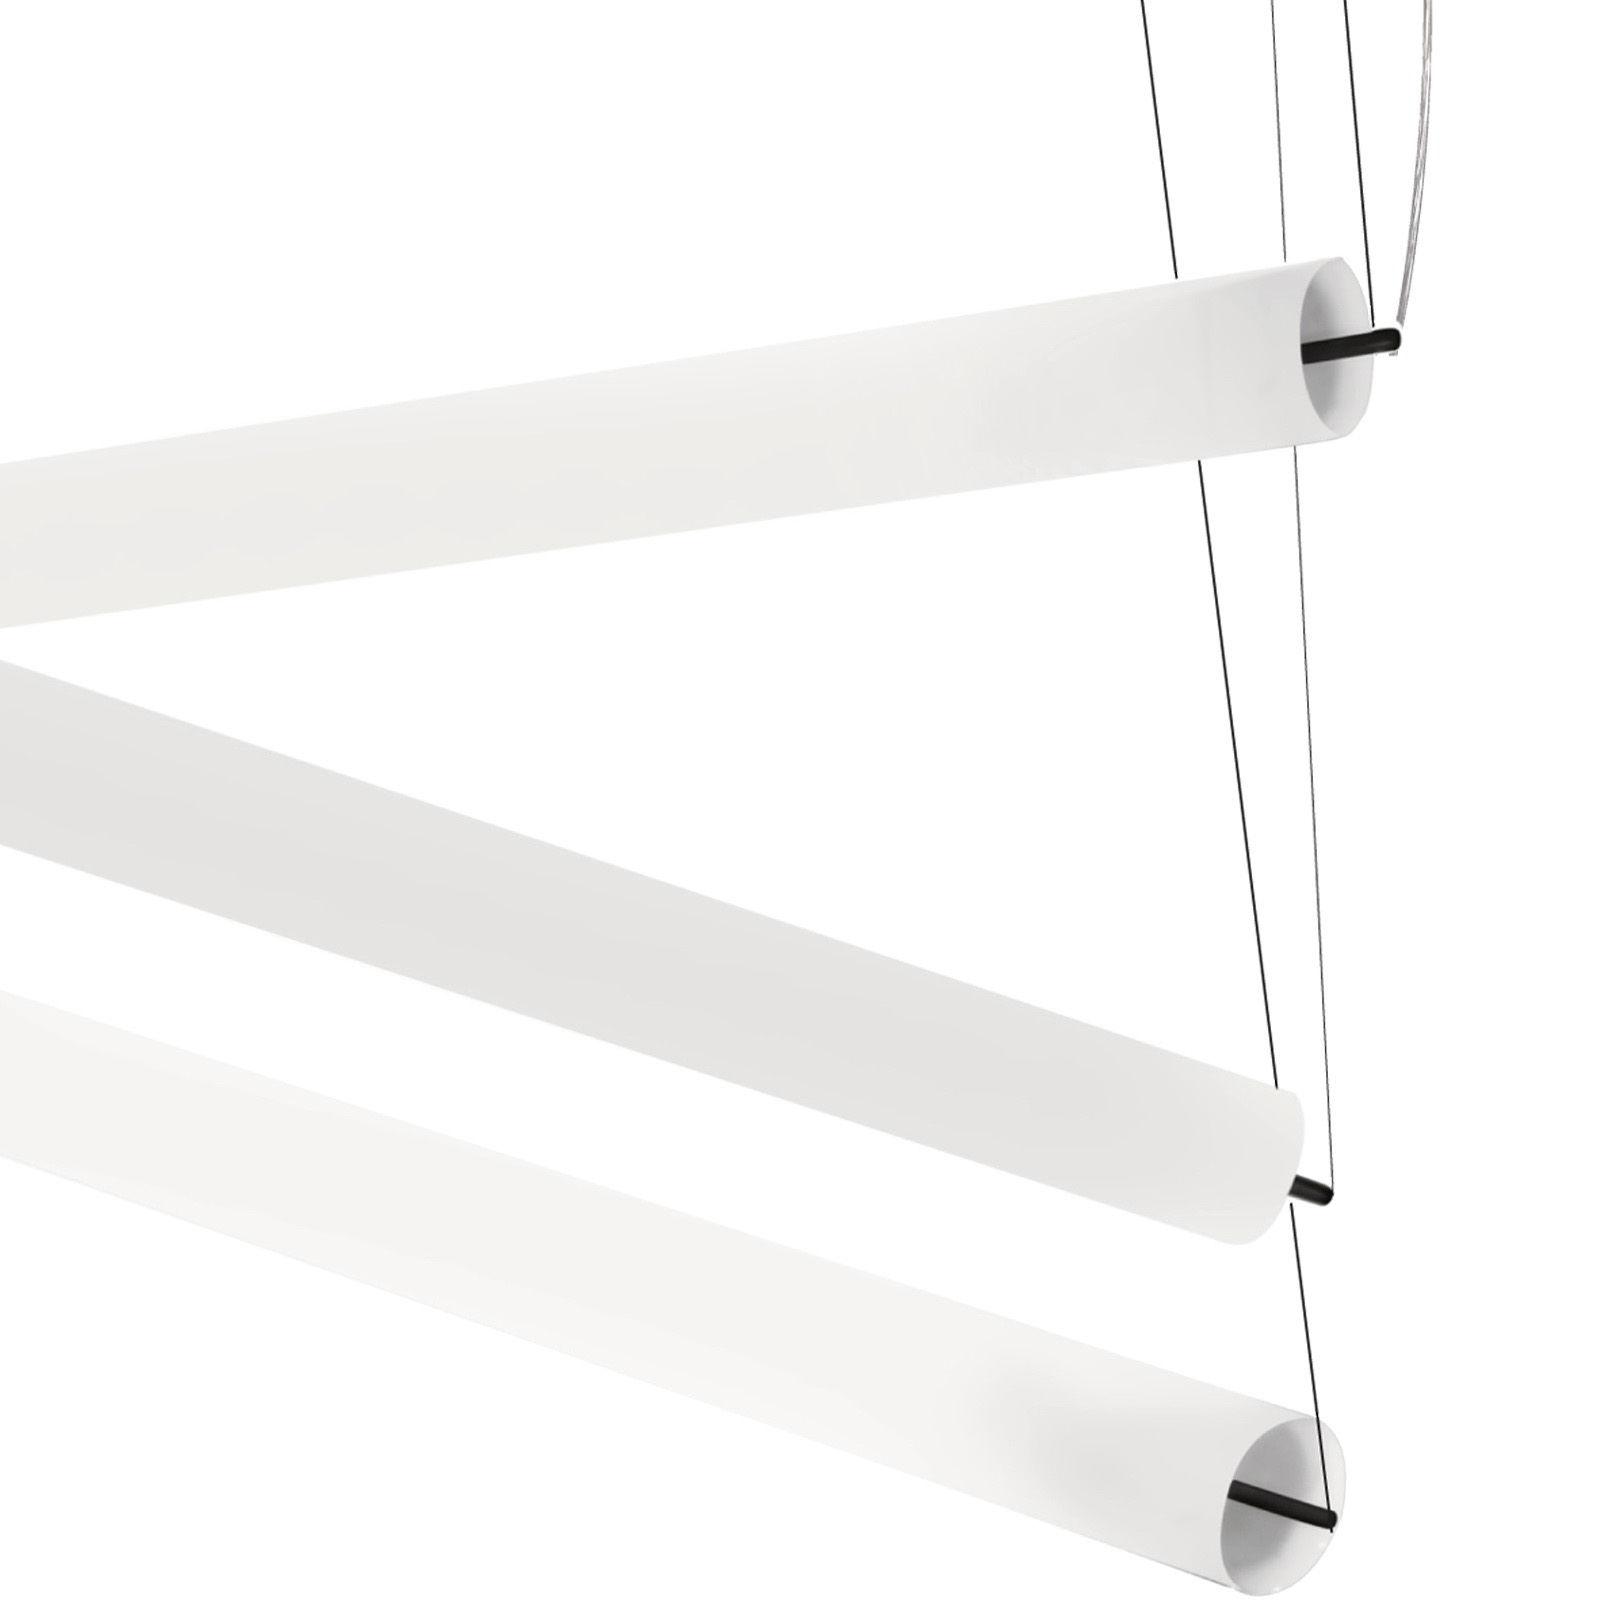 Lighting - Pistillo Pendant - W 180 cm - Modular by Martinelli Luce - White - Methacrylate, Steel